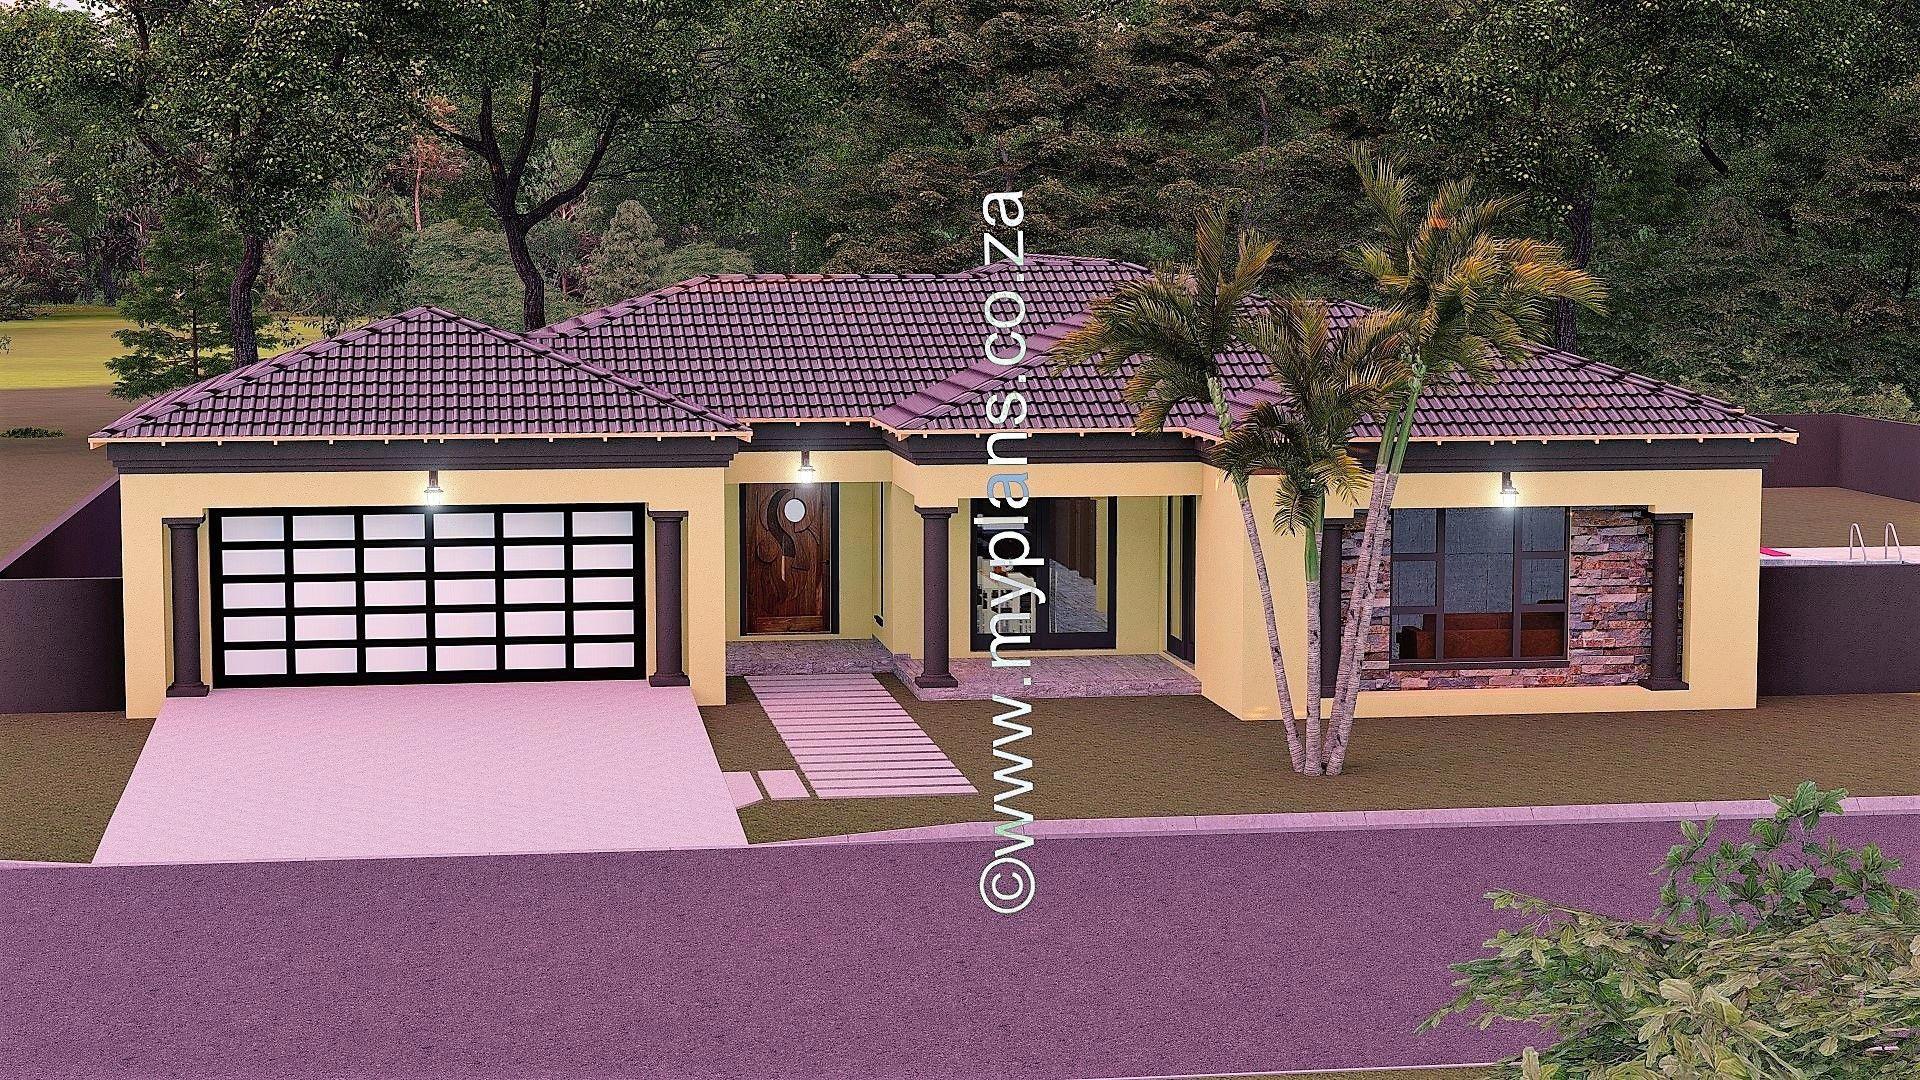 This Tuscan Designed Single Storey 4 Bedroom House Plan Mlb 025s Boasting Full Master Suite Inc House Plans South Africa Bedroom House Plans Tuscan House Plans